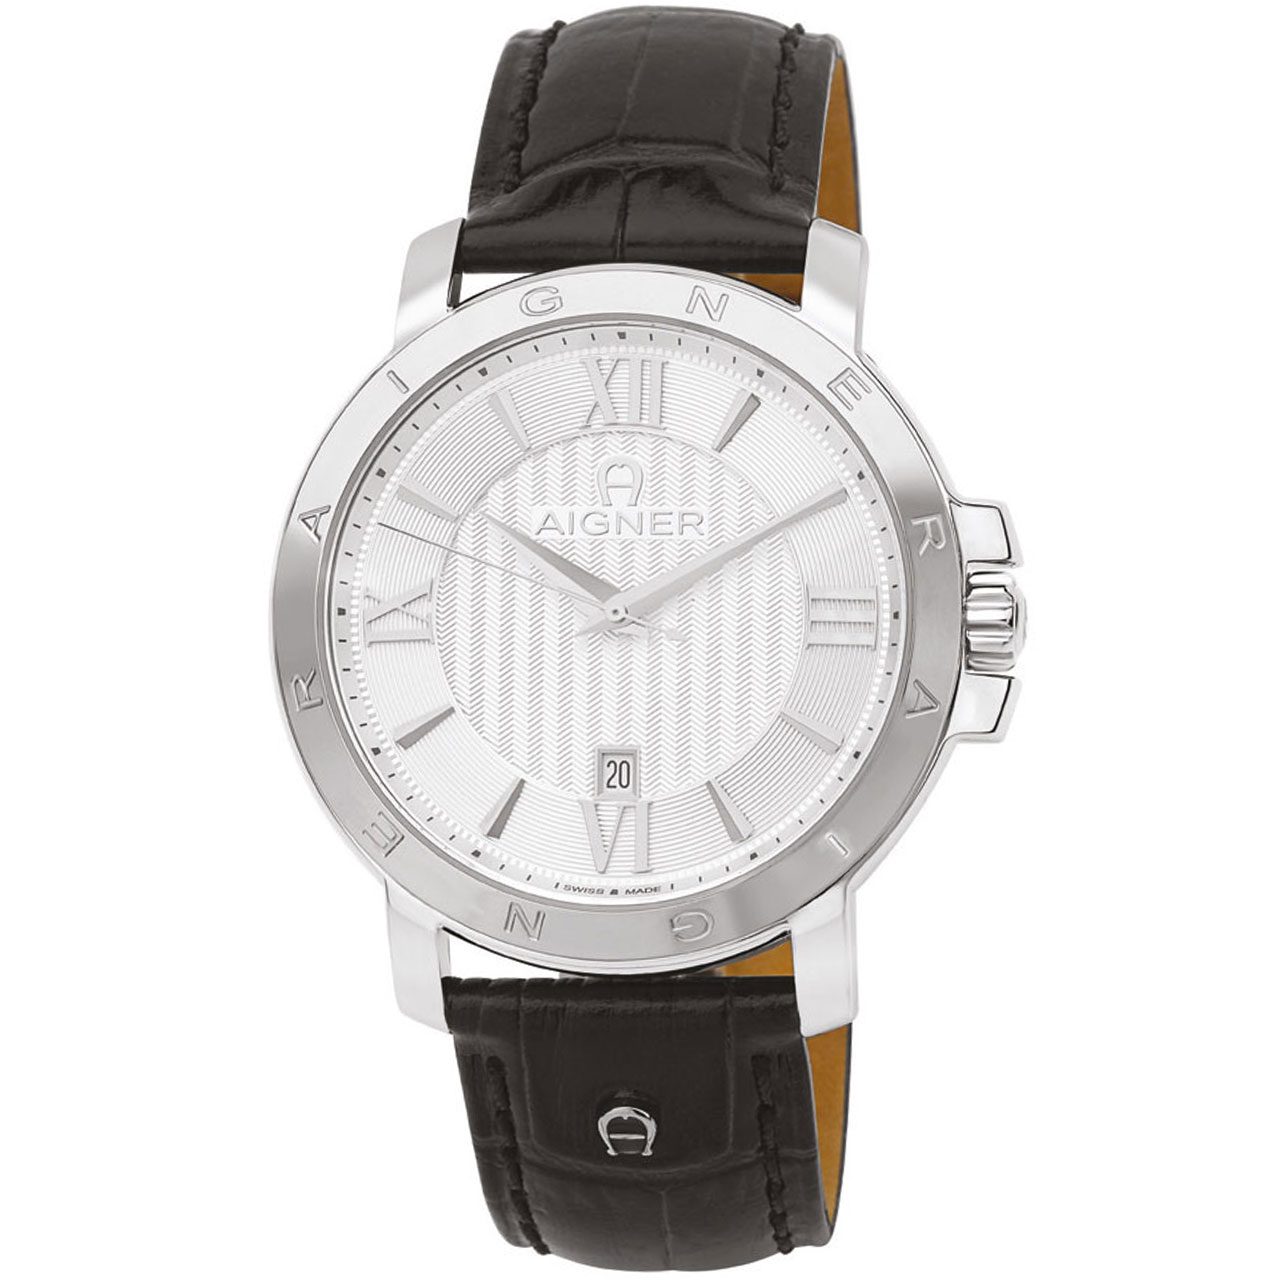 ساعت مچی عقربه ای مردانه اگنر مدل A09015 10